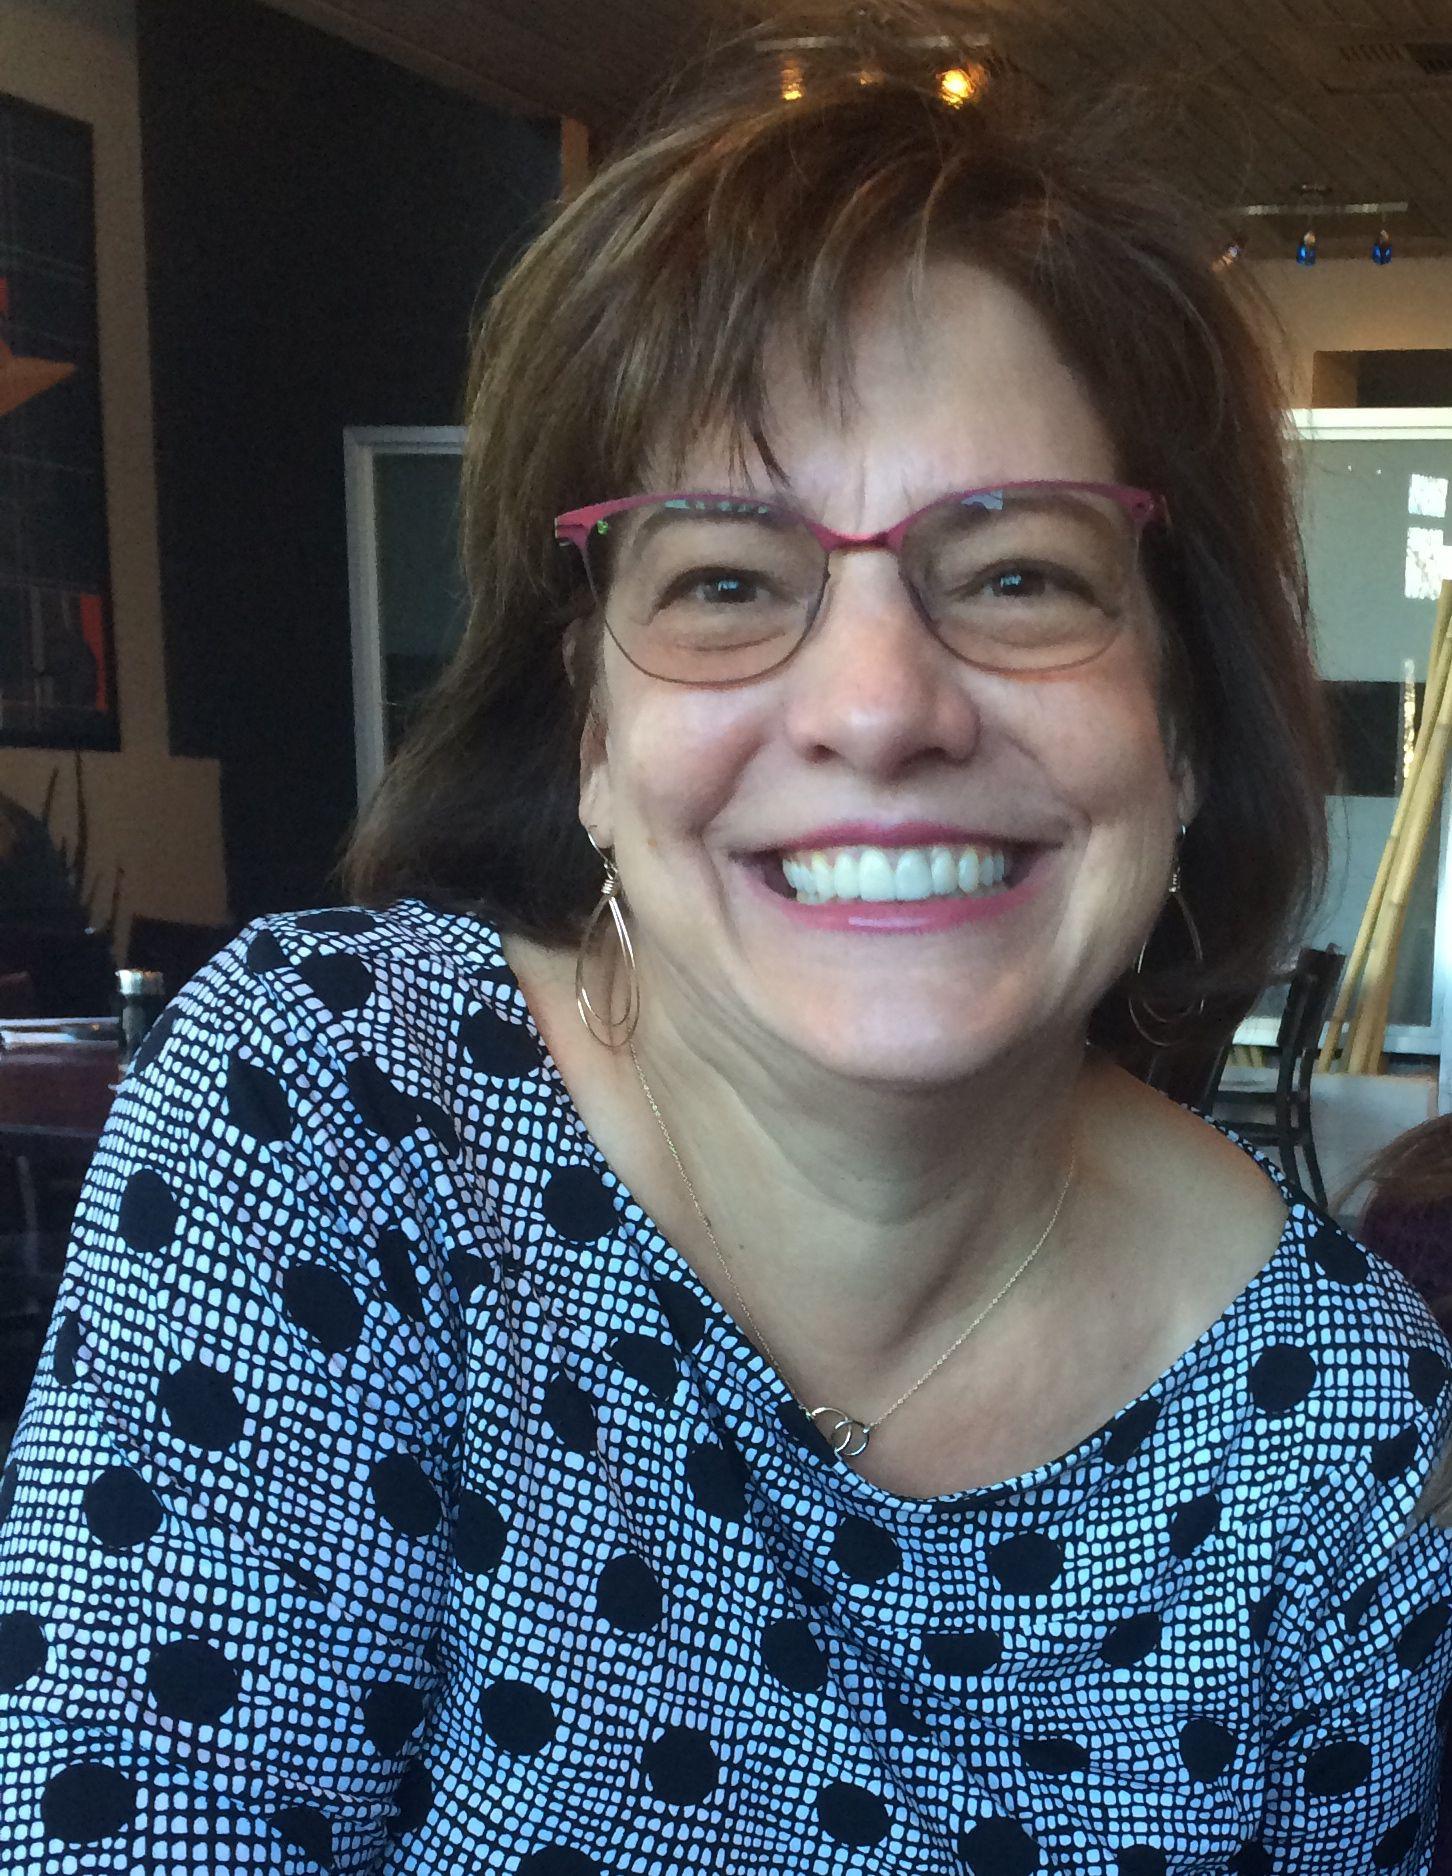 Discussion on this topic: Emma Harris, maria-aitken-born-1945/